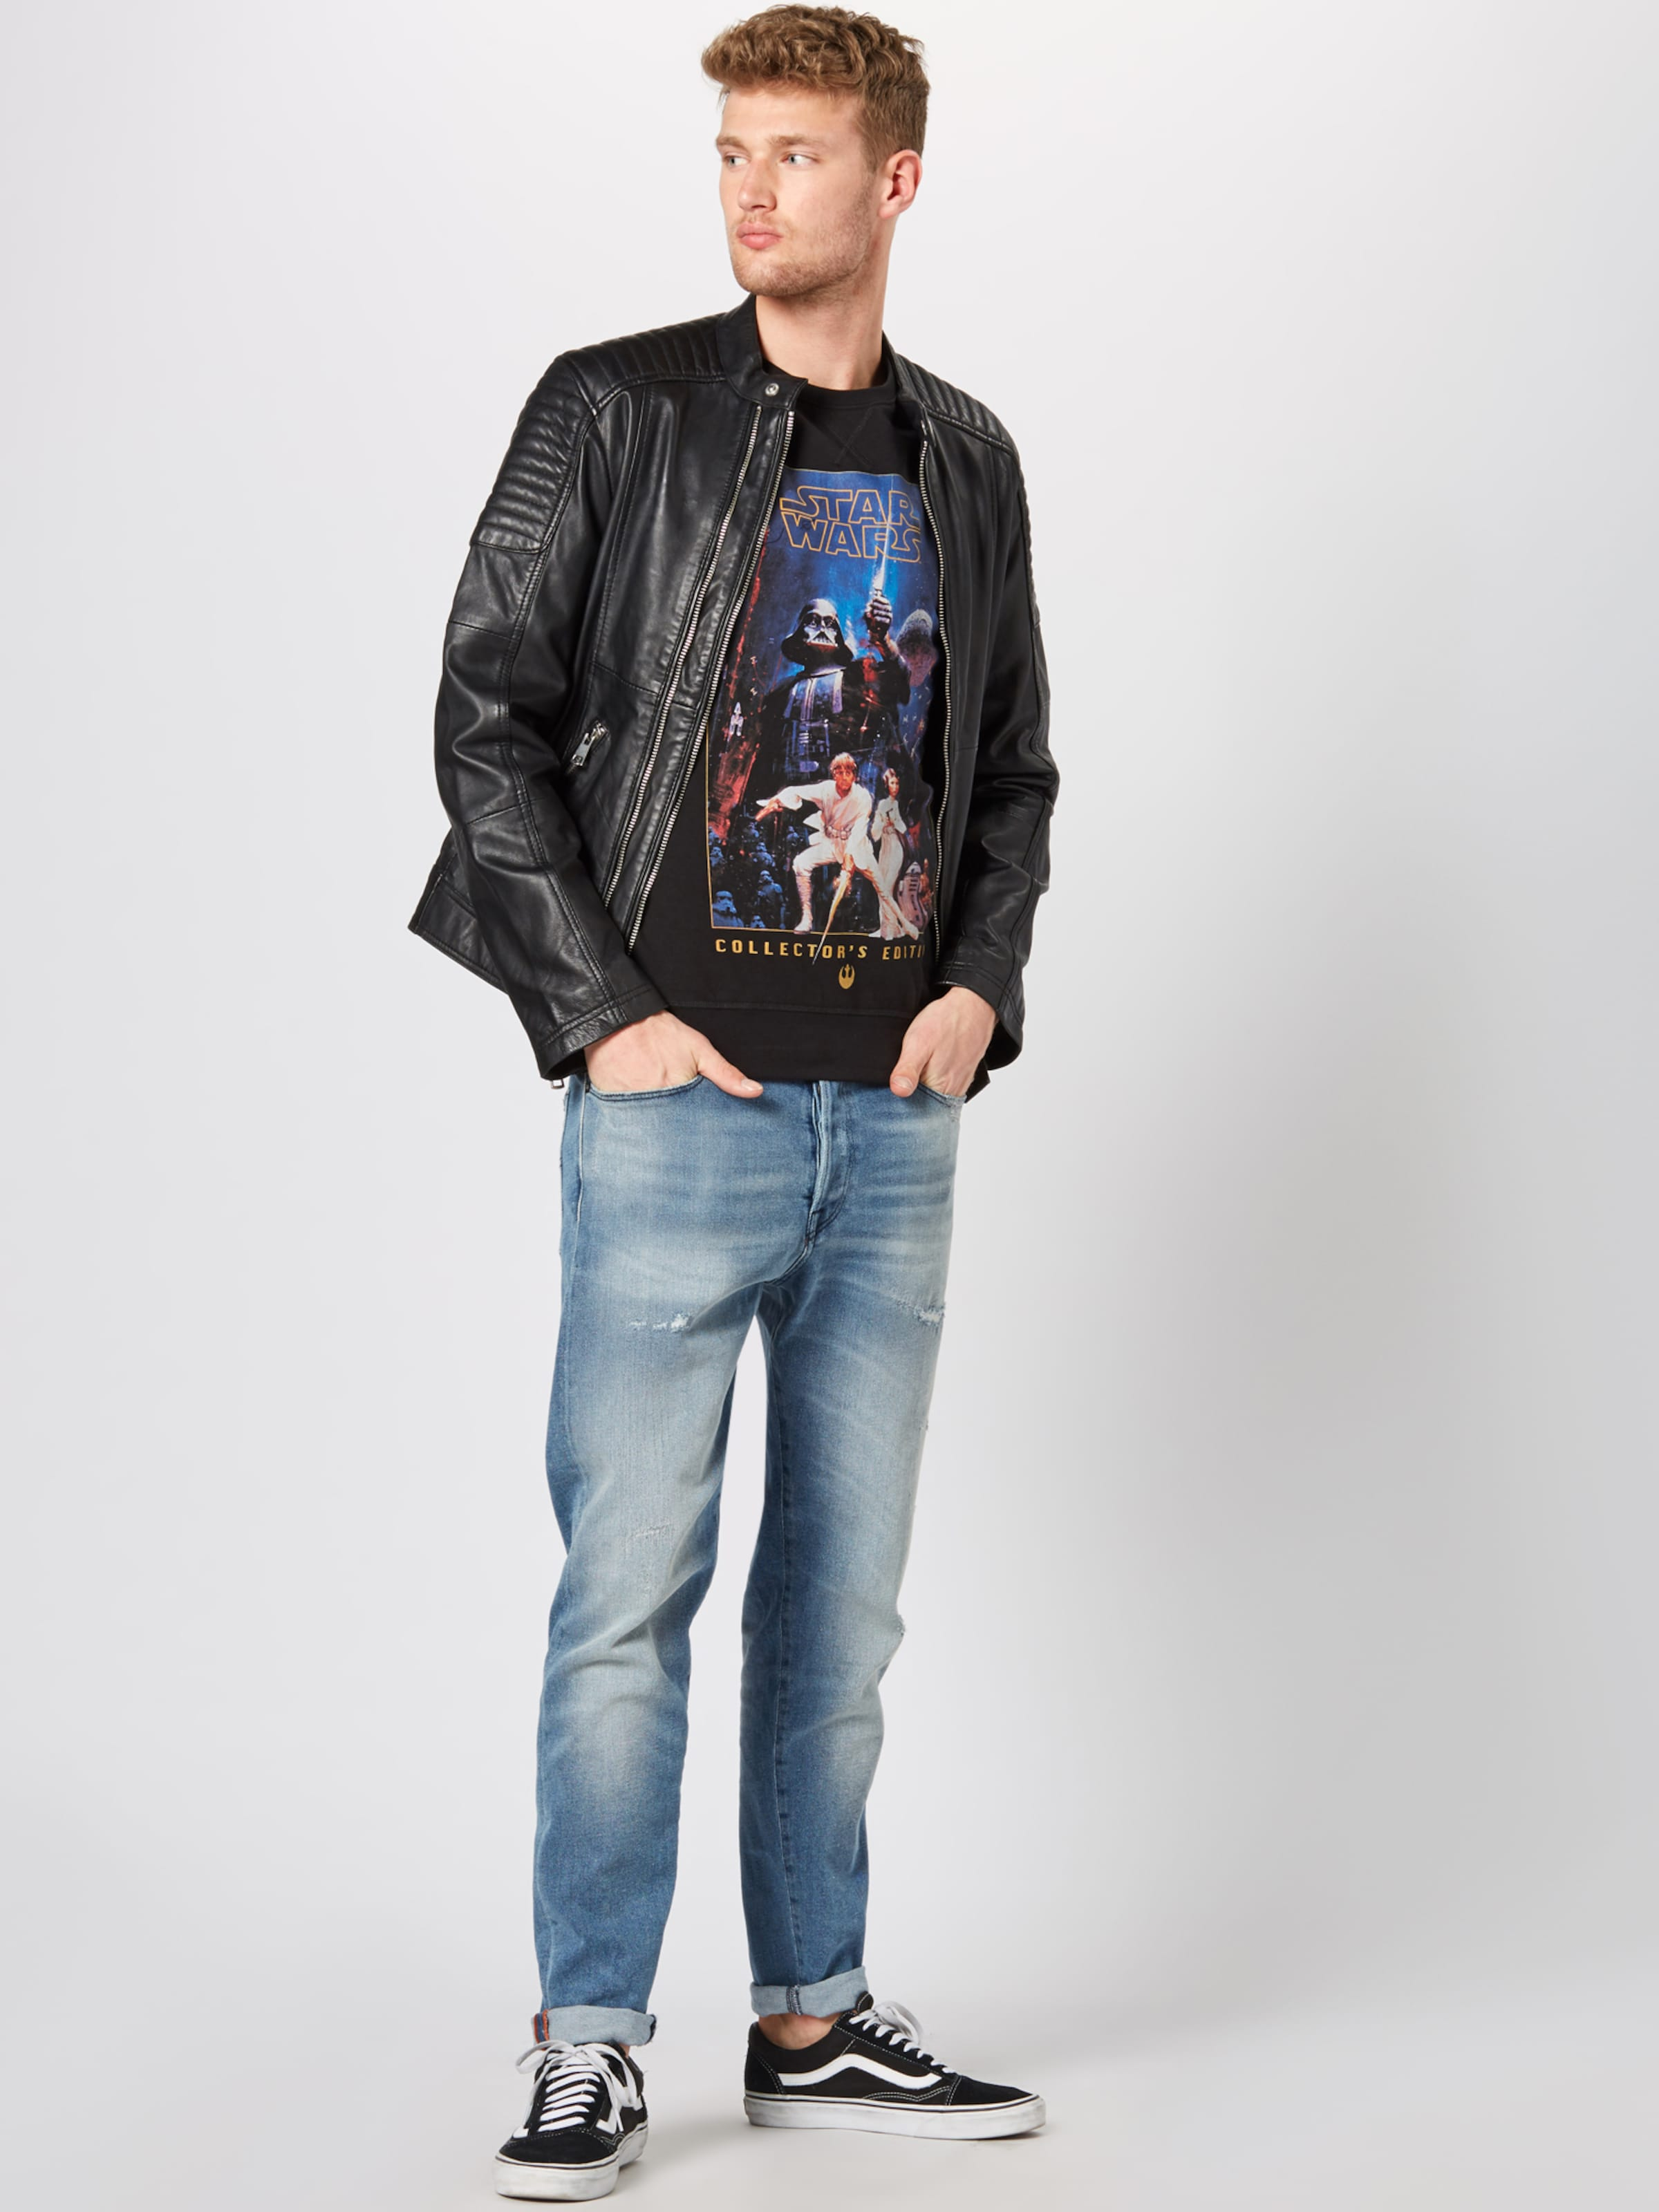 Collectors Tee BlauSchwarz Poster Wars Shirt In 'star Edition Mister Crewneck' TJculFK13